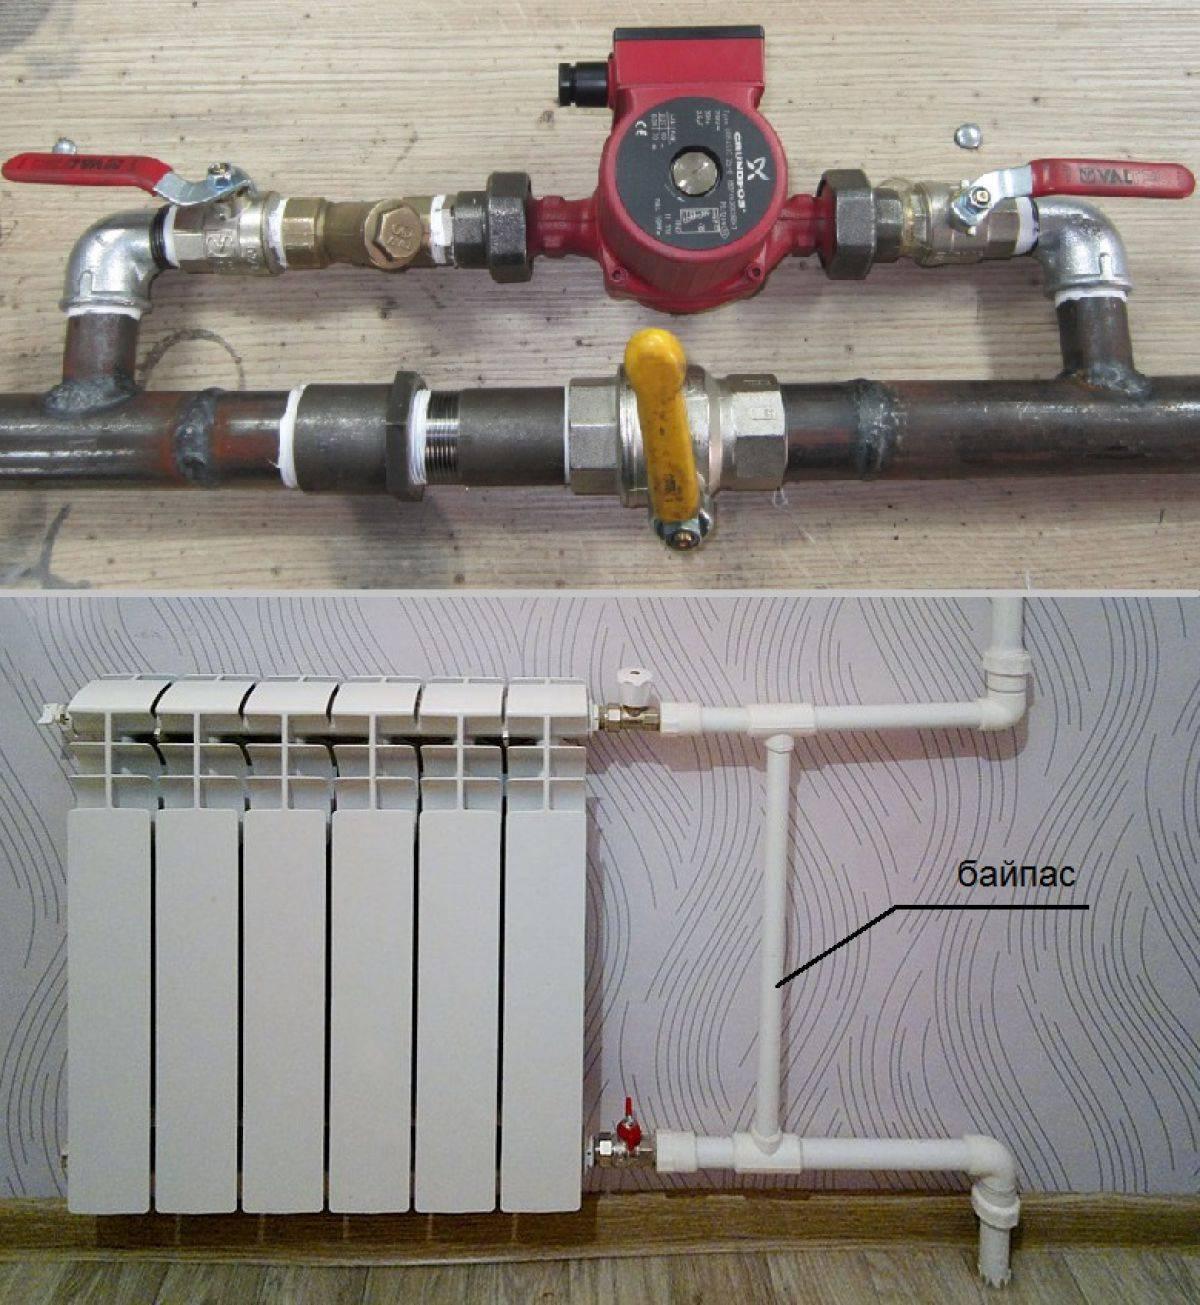 Байпас, что такое байпас | блог инженера теплоэнергетика